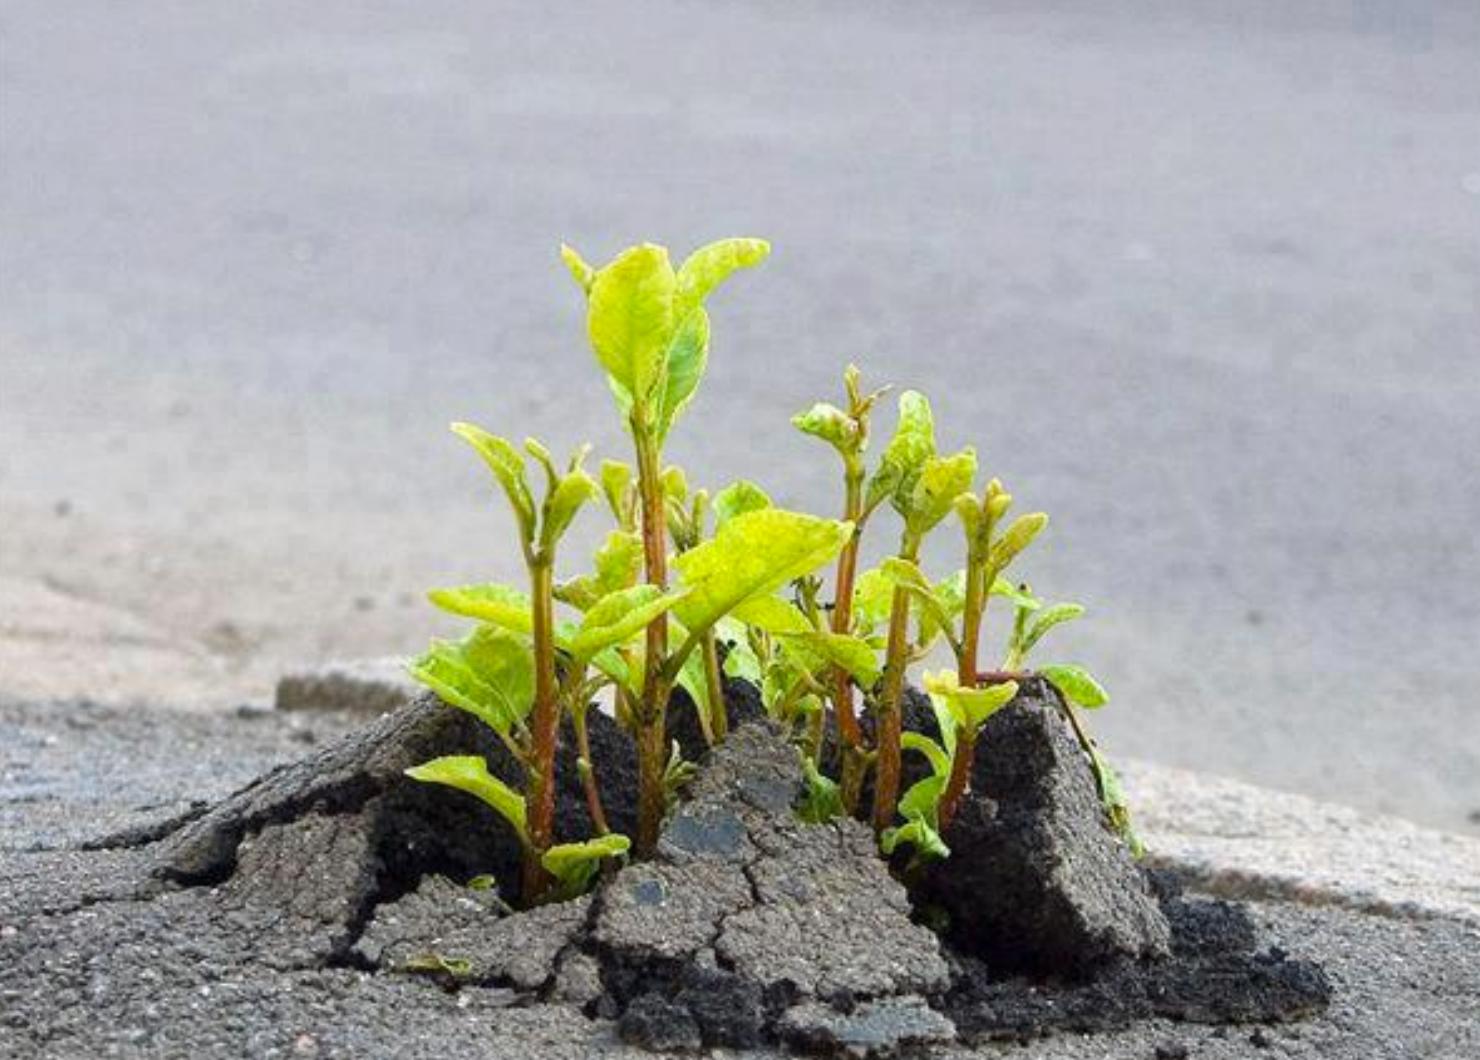 Plant Breaking Through Soil